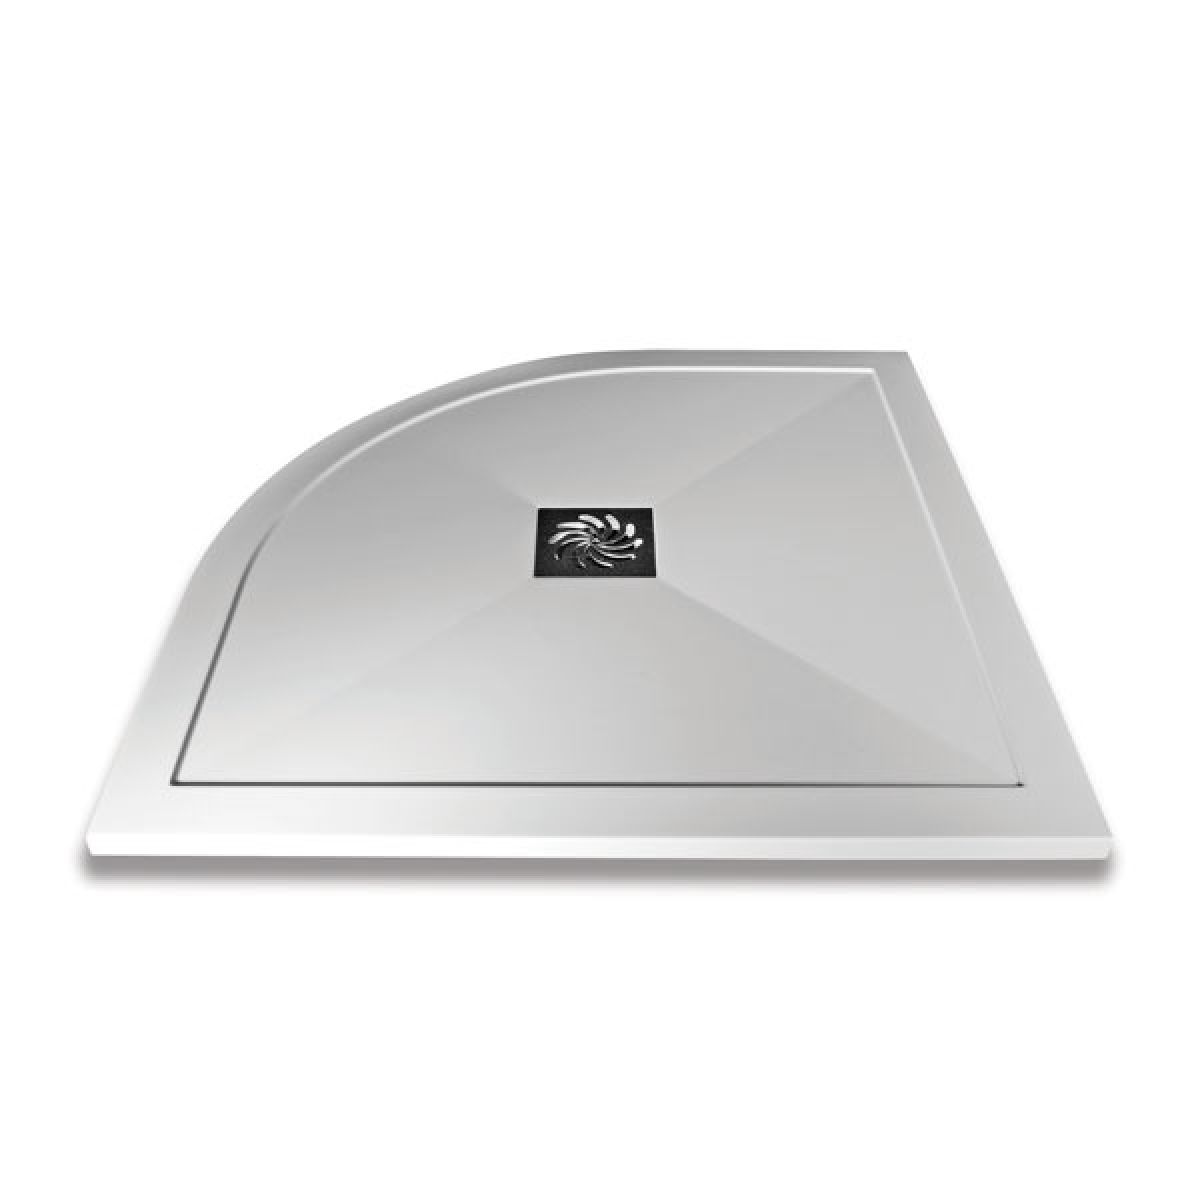 Frontline Slimline Quadrant Shower Tray 900 x 900mm